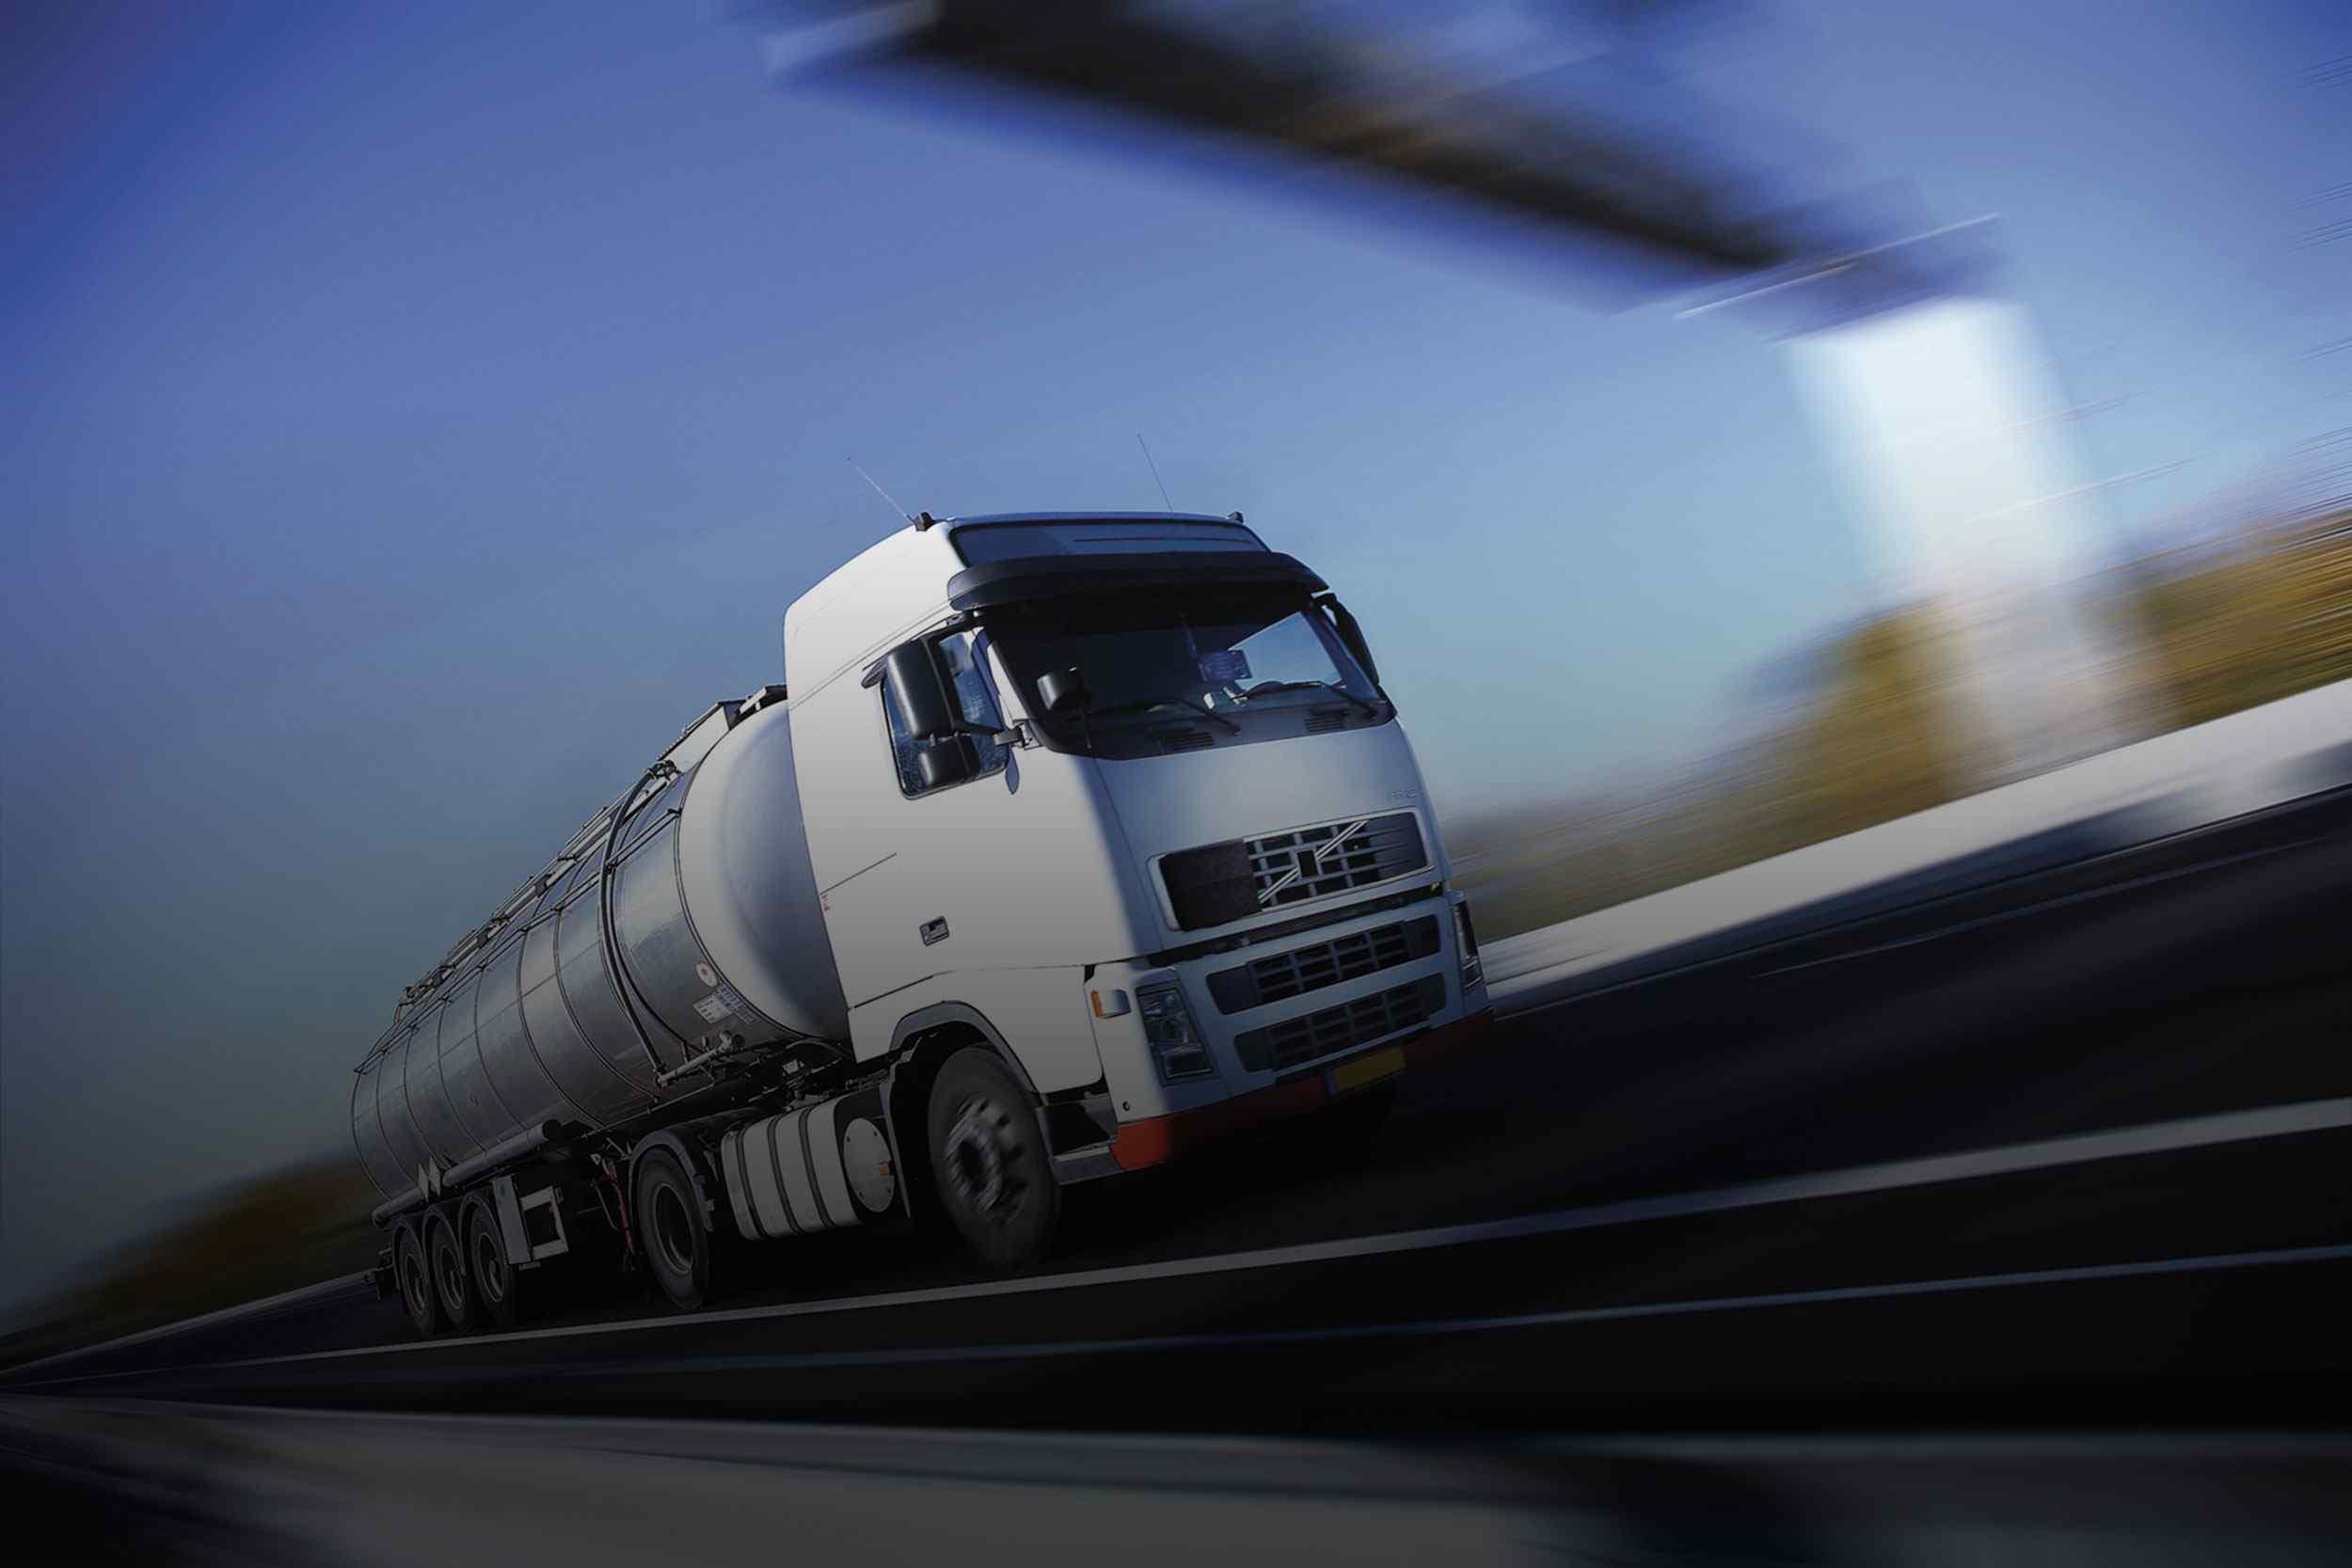 http://shadowtrans.co.za/wp-content/uploads/2015/09/White-Truck-single.jpg